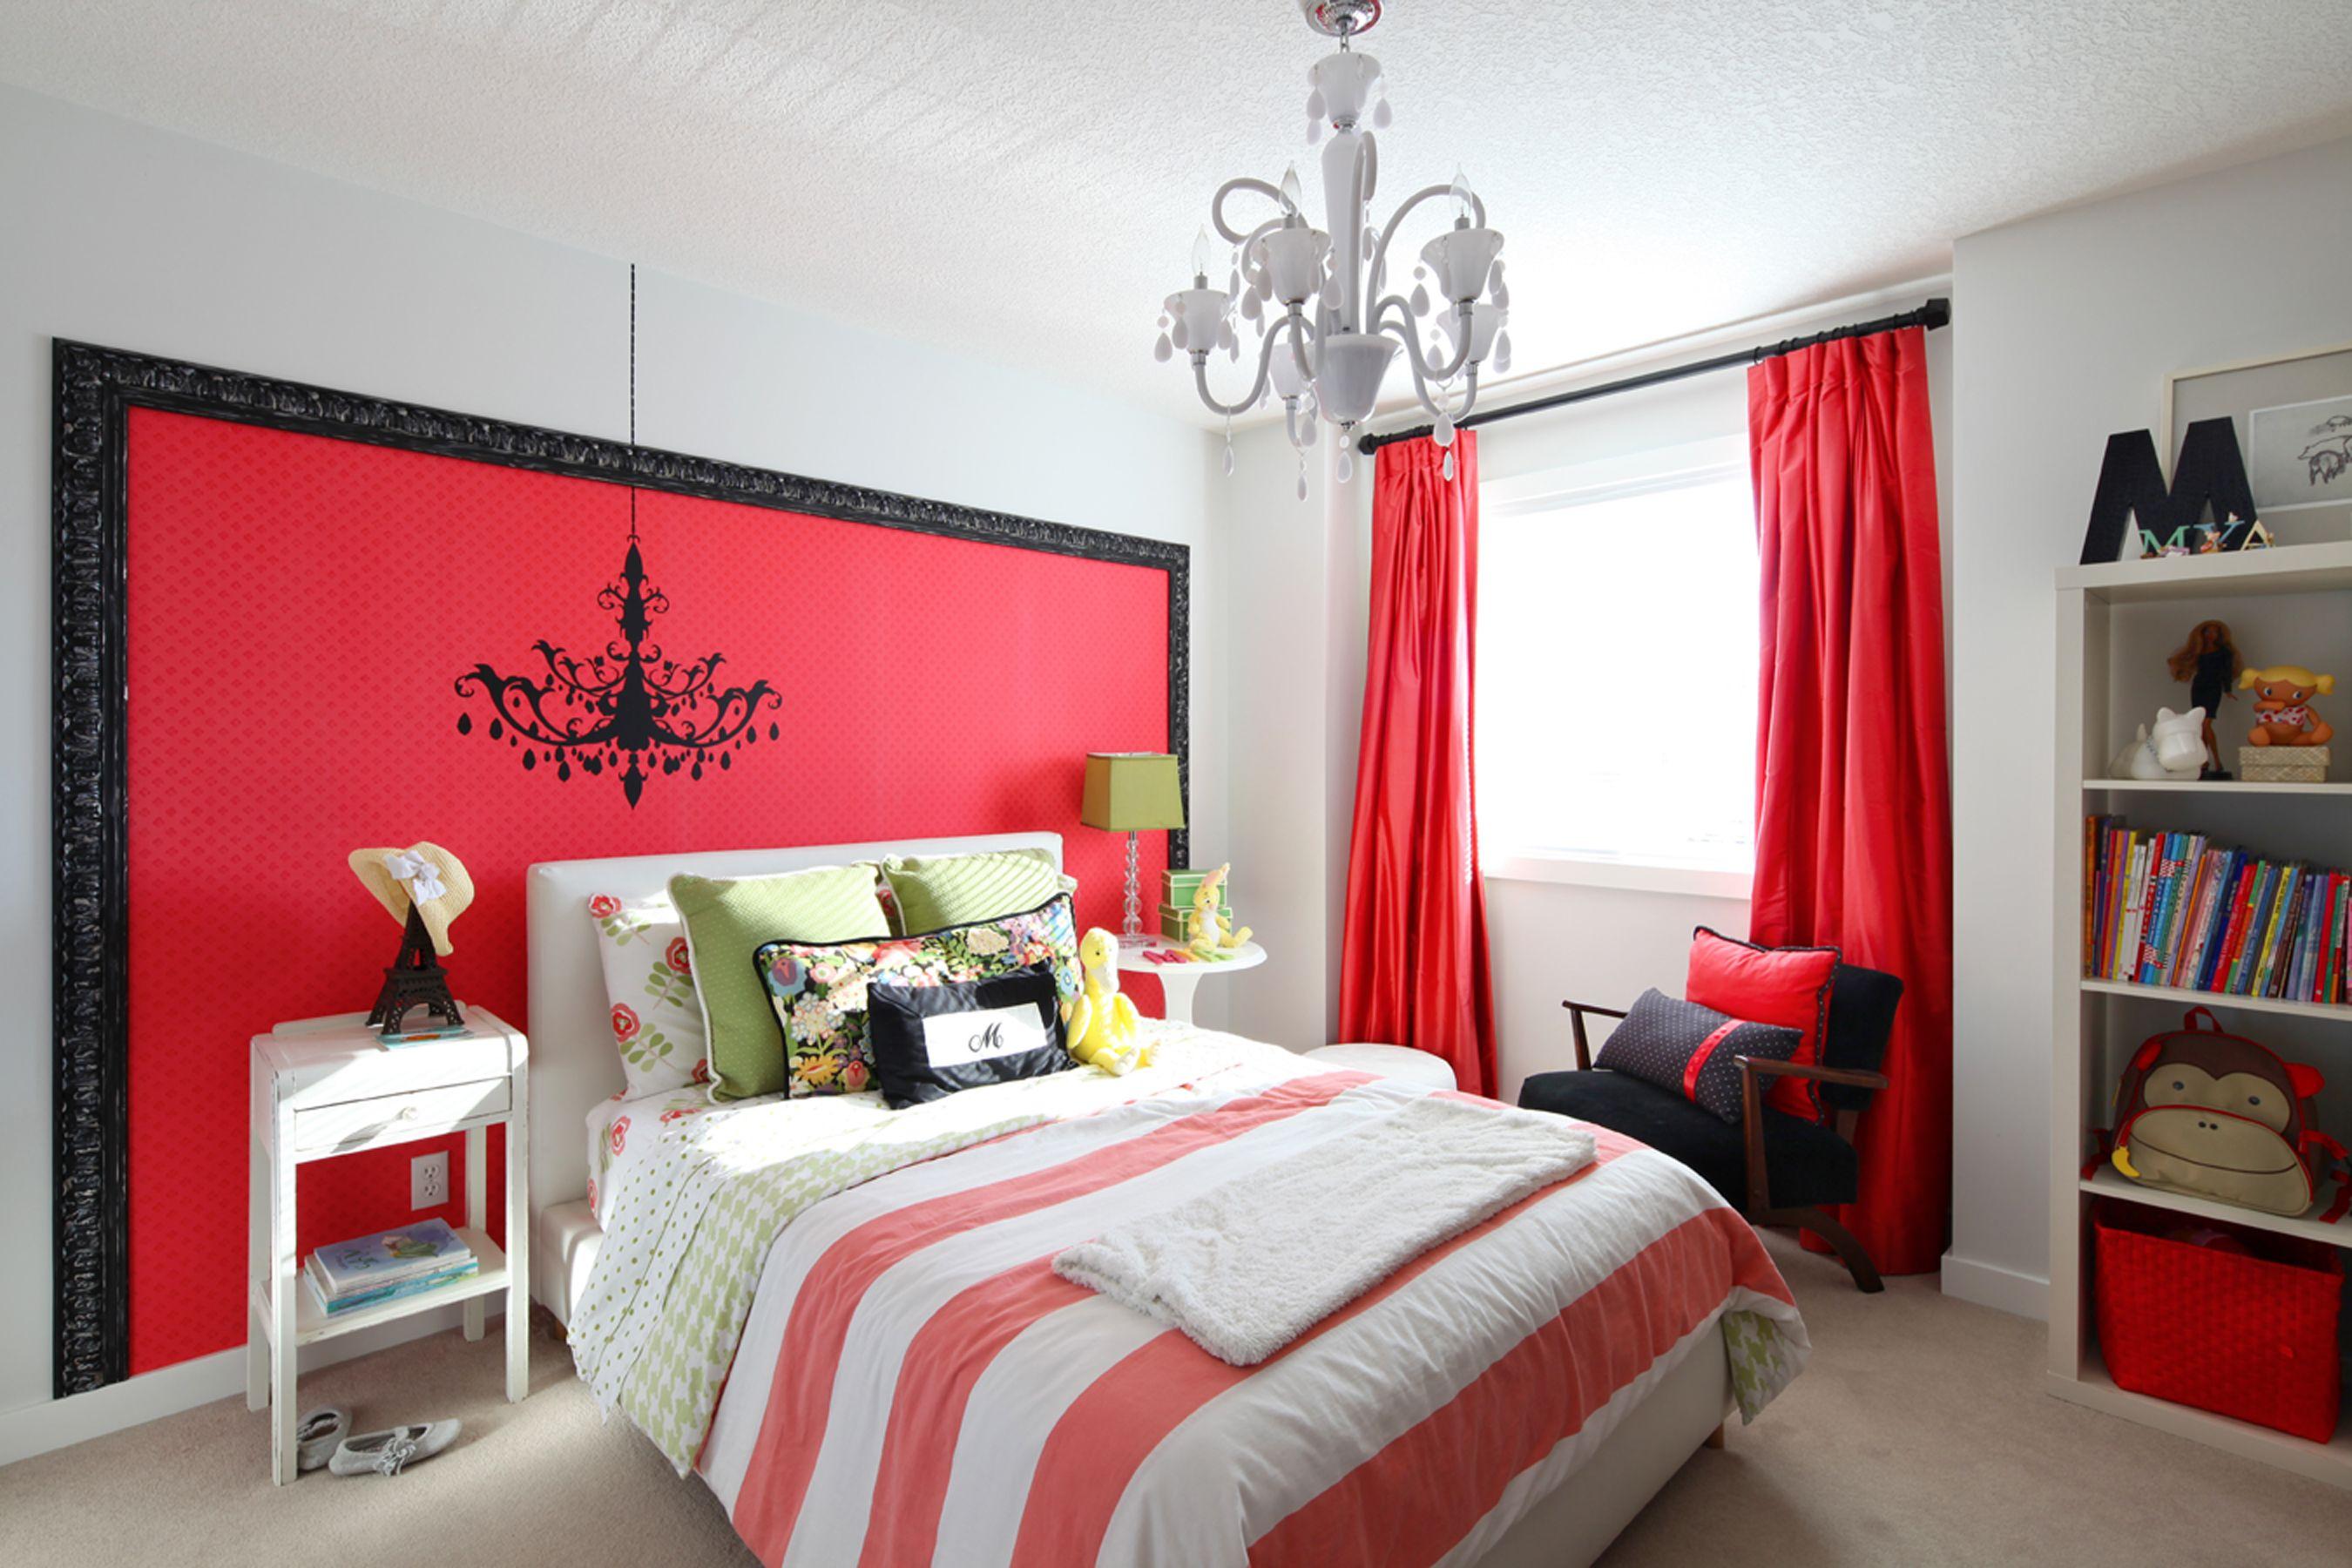 Best Images About Teen Girl Bedrooms On Pinterest Little Girl - Girl bedroom colors